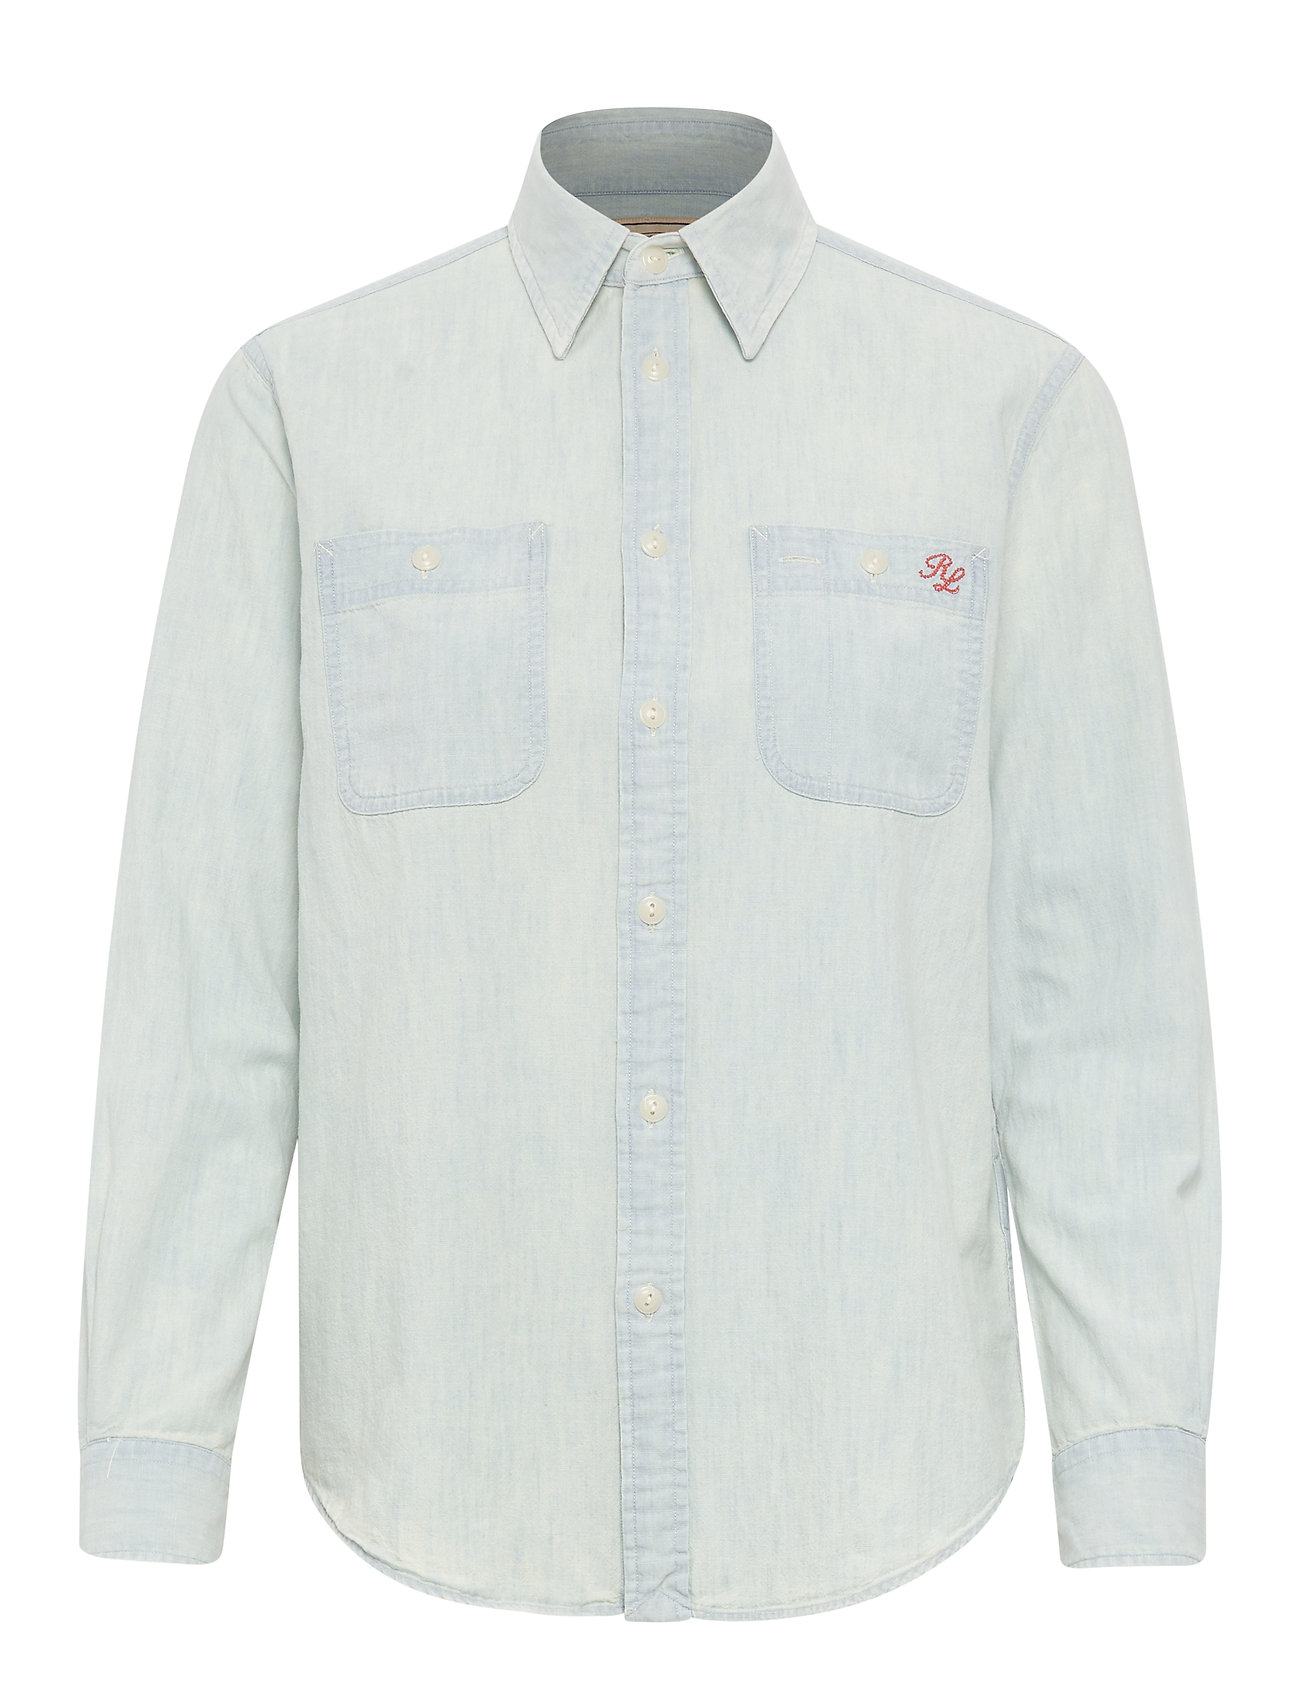 Polo Ralph Lauren Polo Bear Chambray Shirt - CHAMBRAY